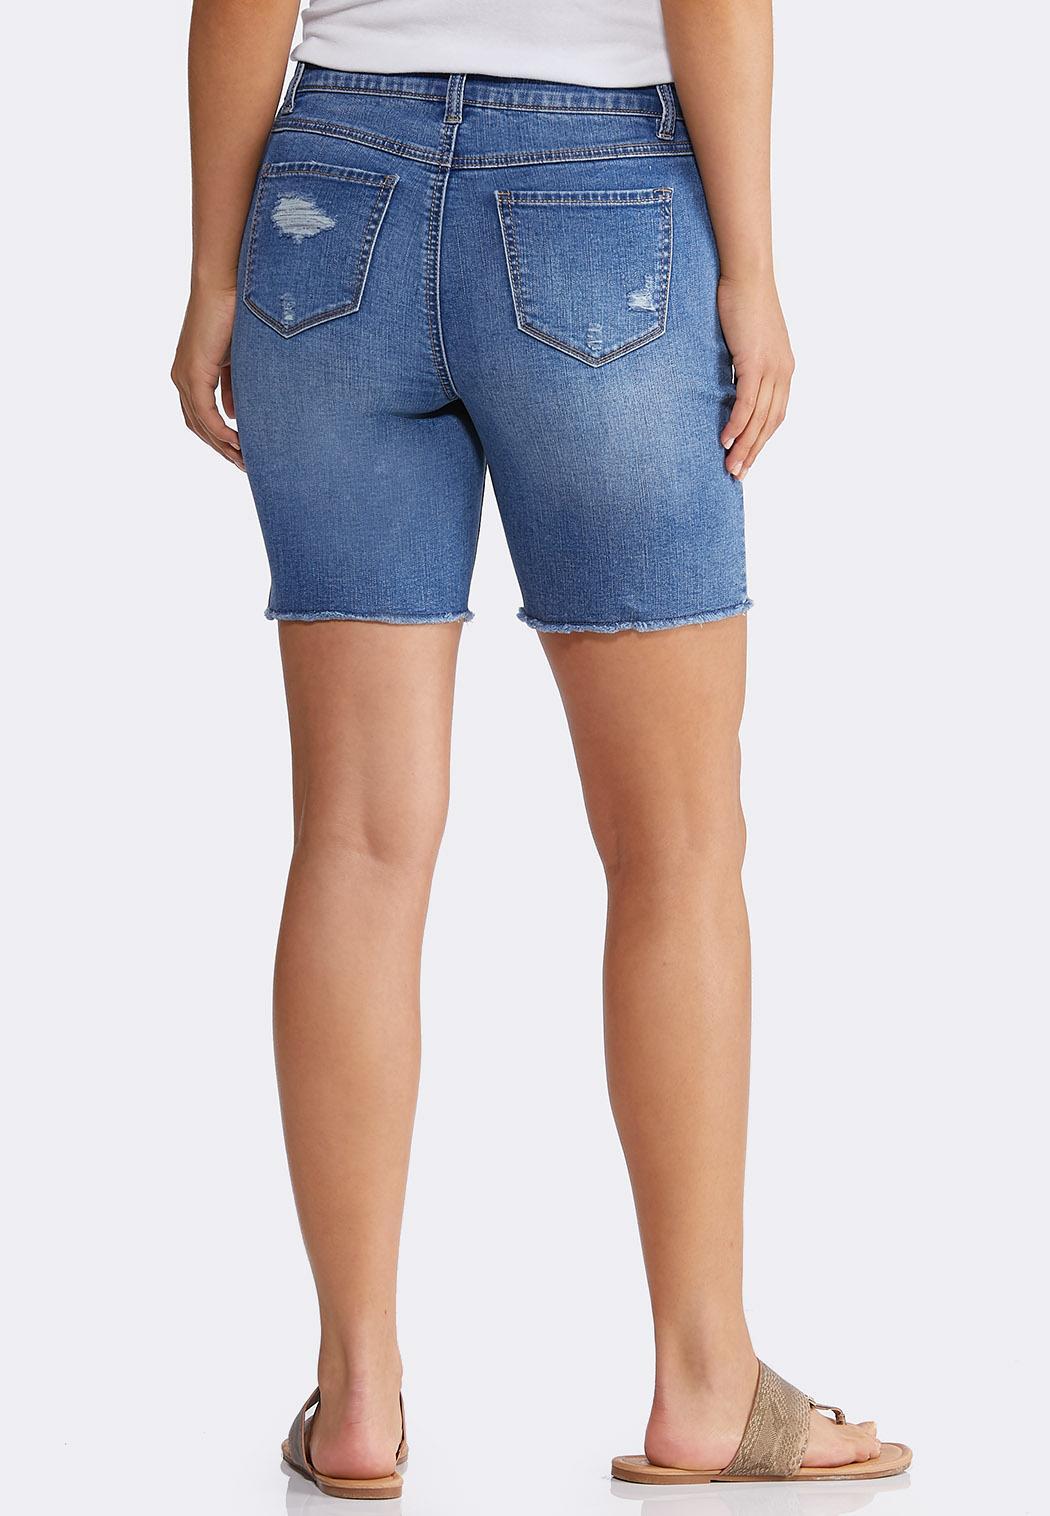 Distressed Jean Shorts (Item #44204032)